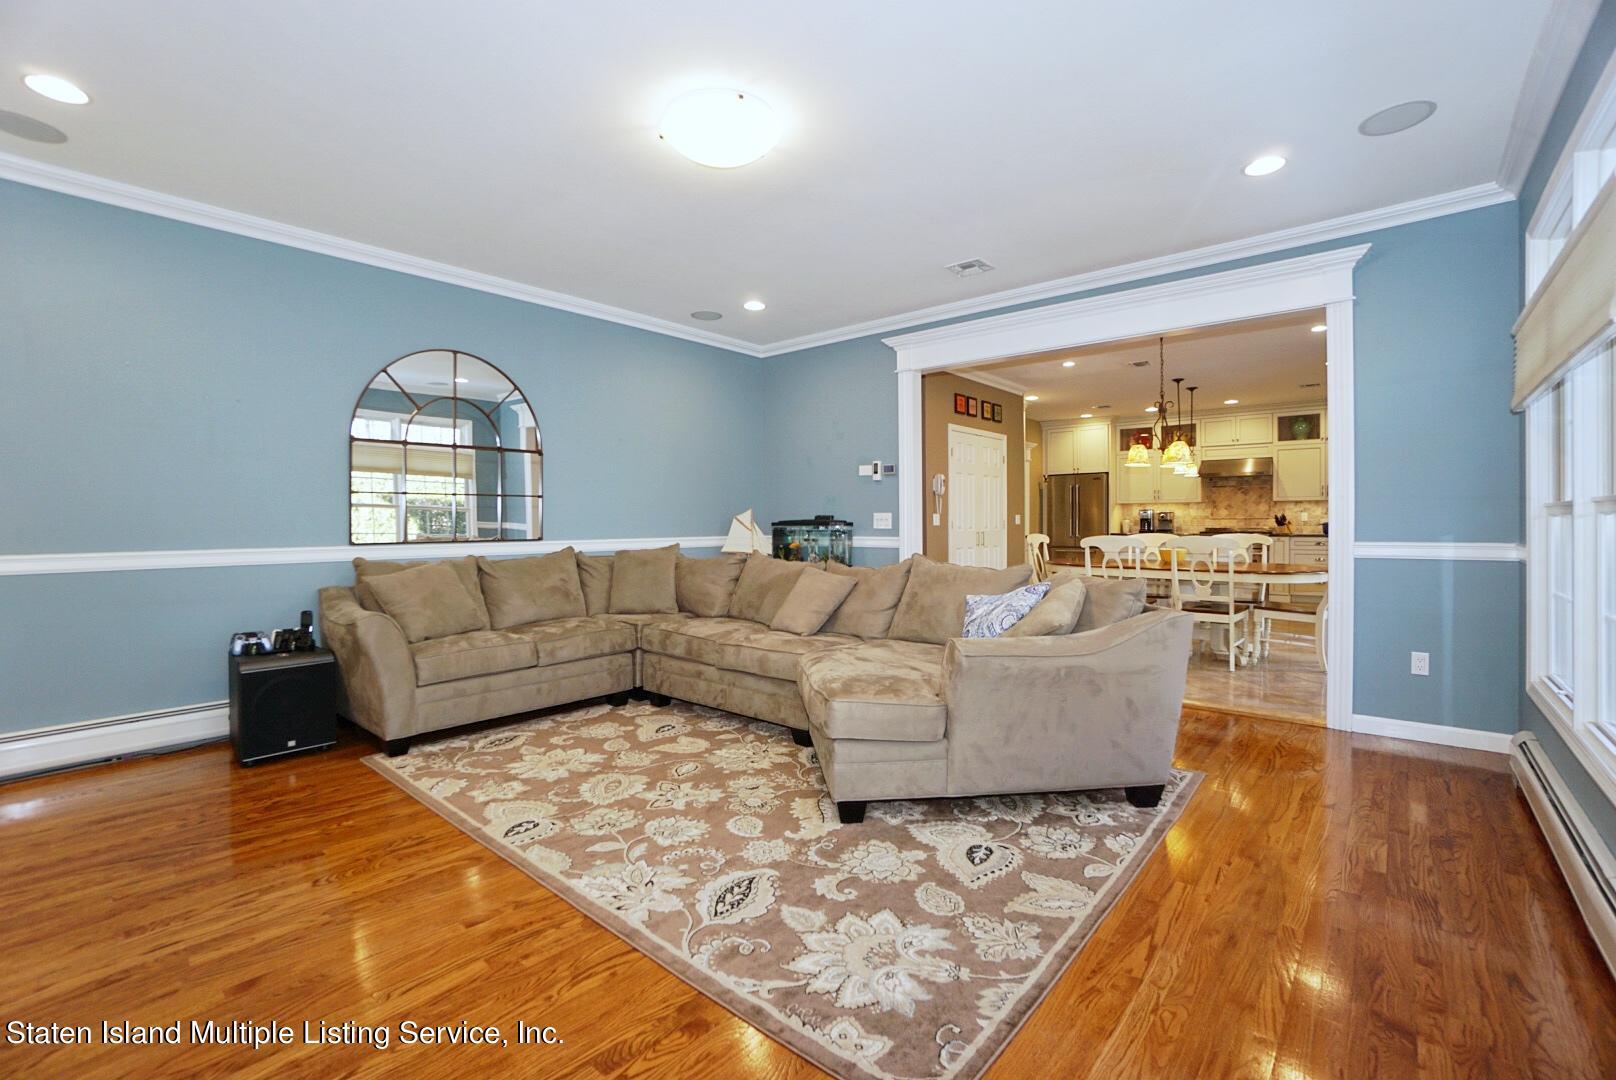 Single Family - Detached 31 Belwood Loop  Staten Island, NY 10307, MLS-1143133-18